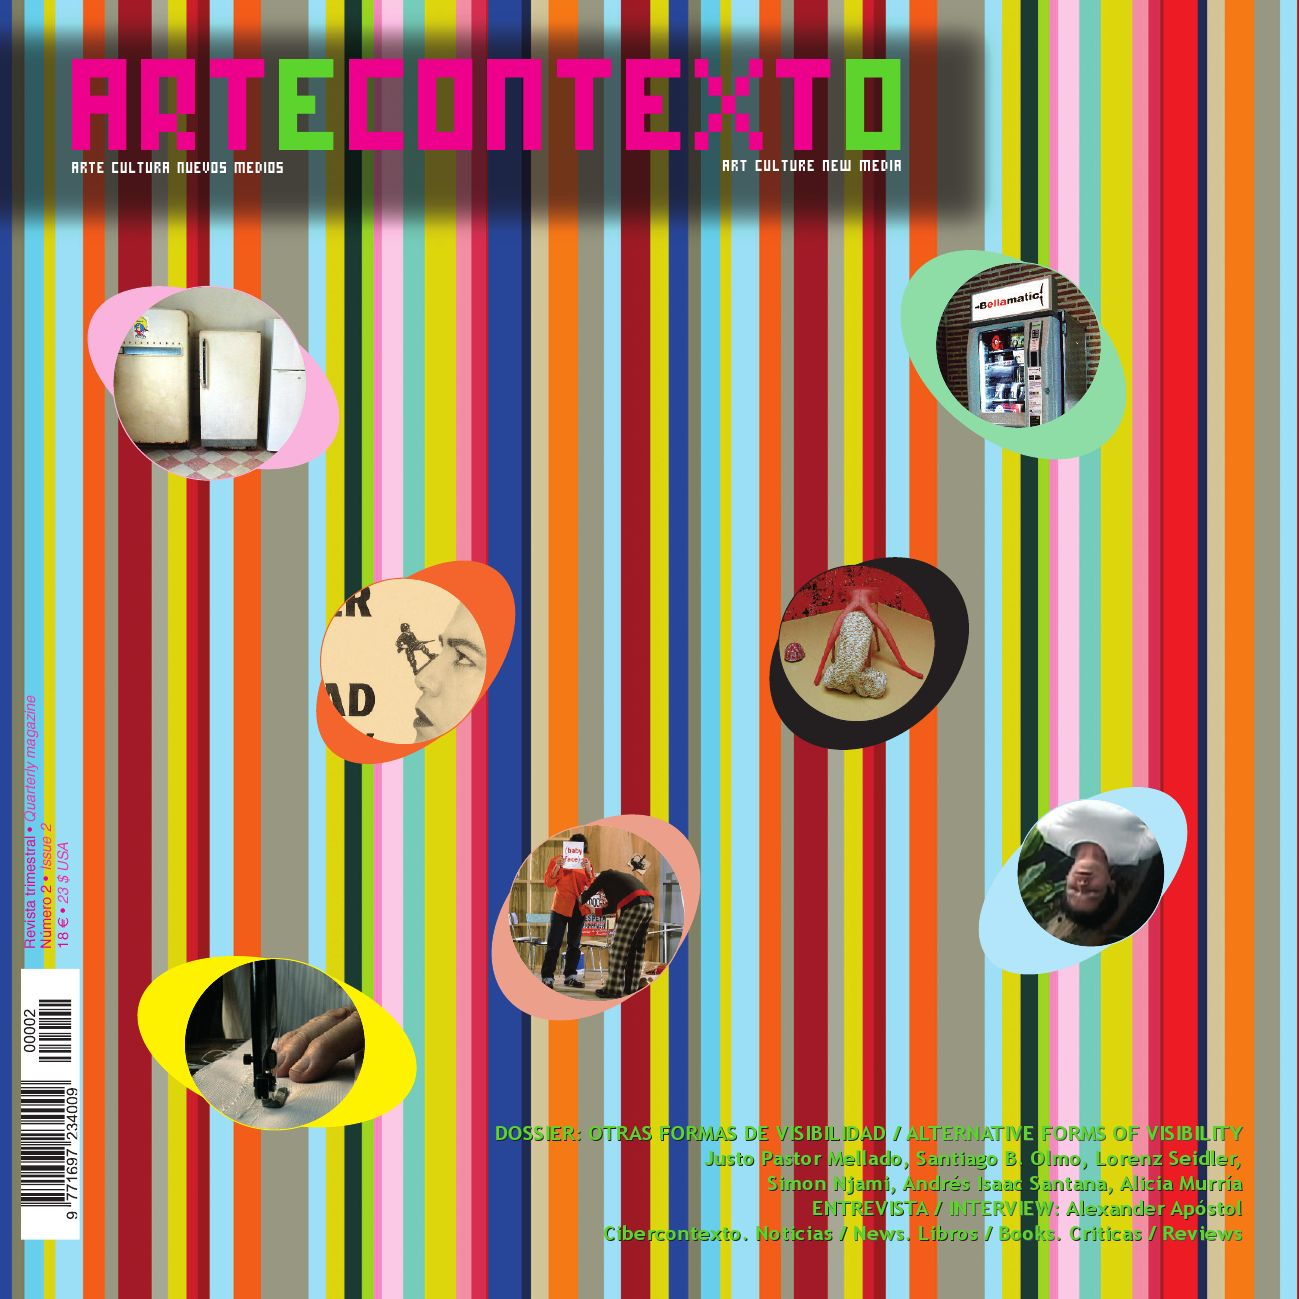 ARTECONTEXTO Nº2 by ARTEHOY Publicaciones y Gestion SL - issuu